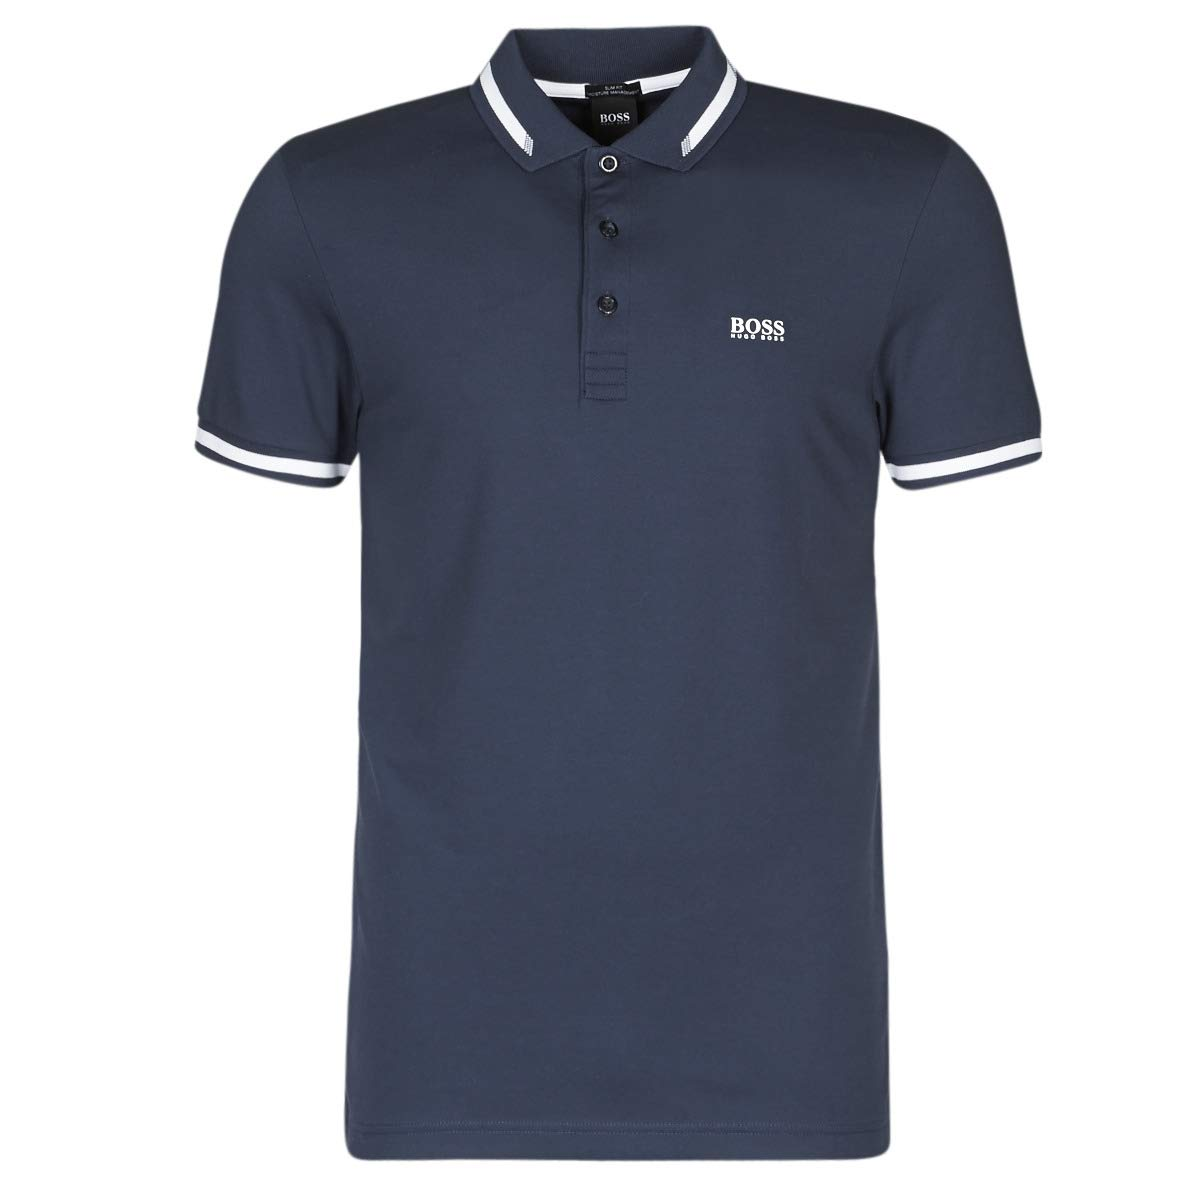 BOSS Paule Tops y Camisetas Hommes Marino - L - Polos Manga Corta ...